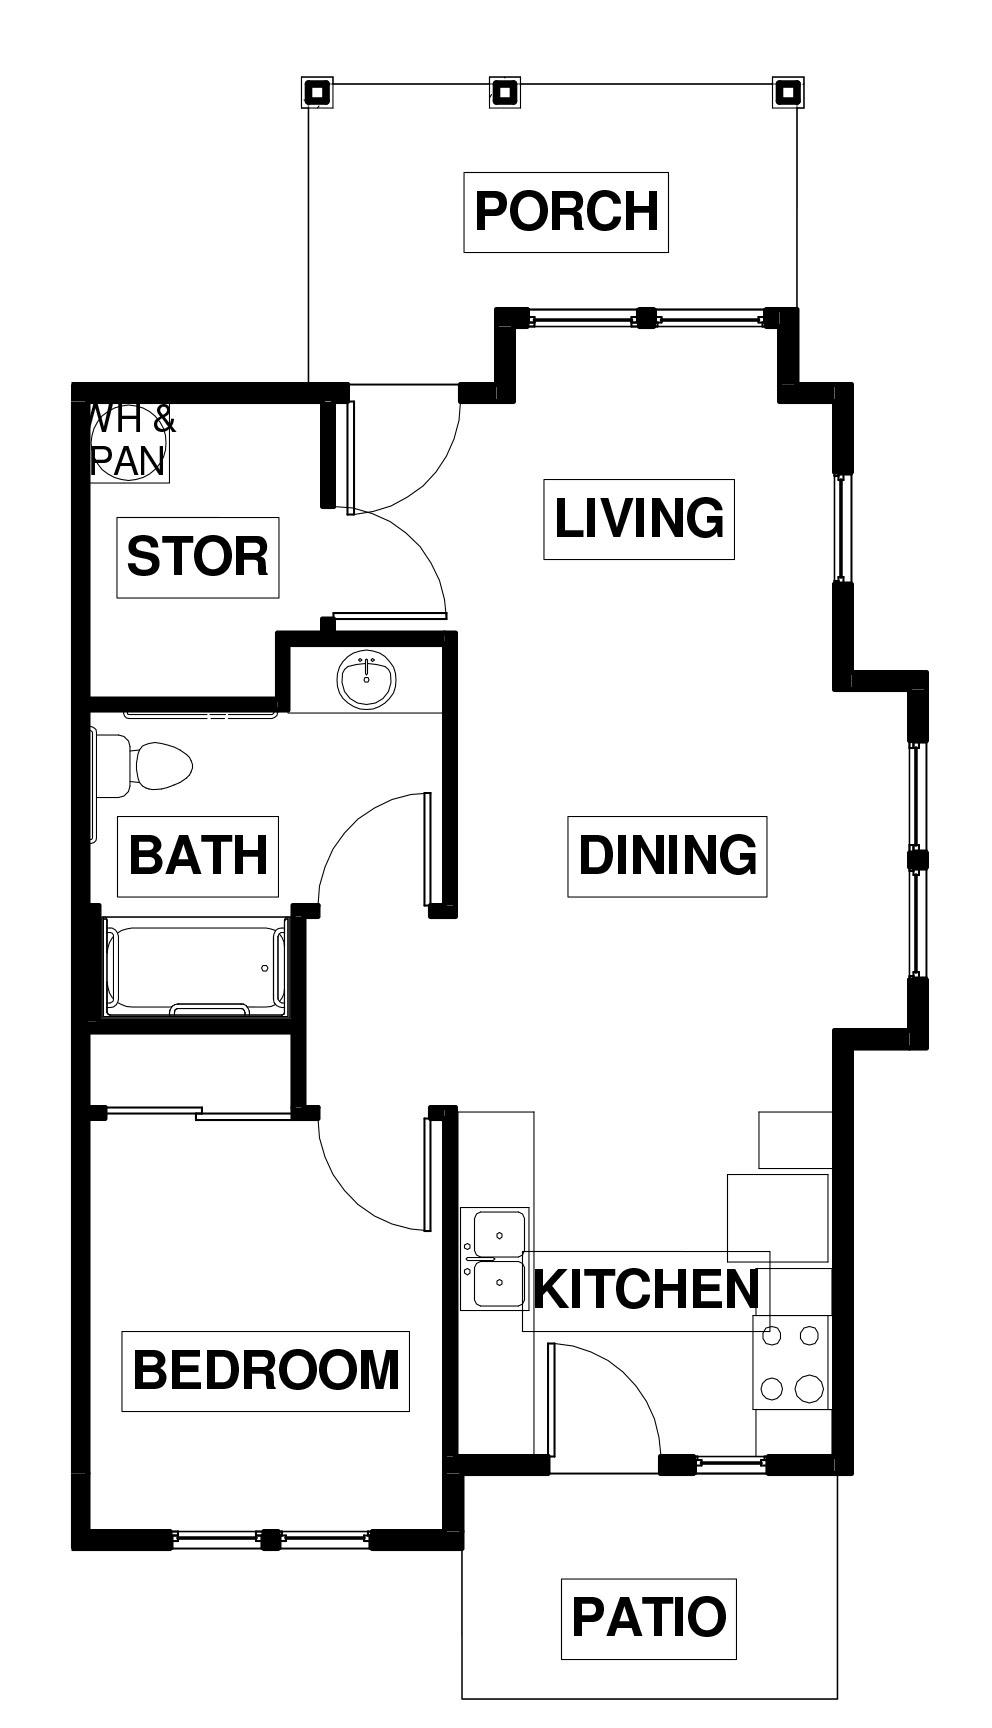 Image Result For Craigslist Apartment Map